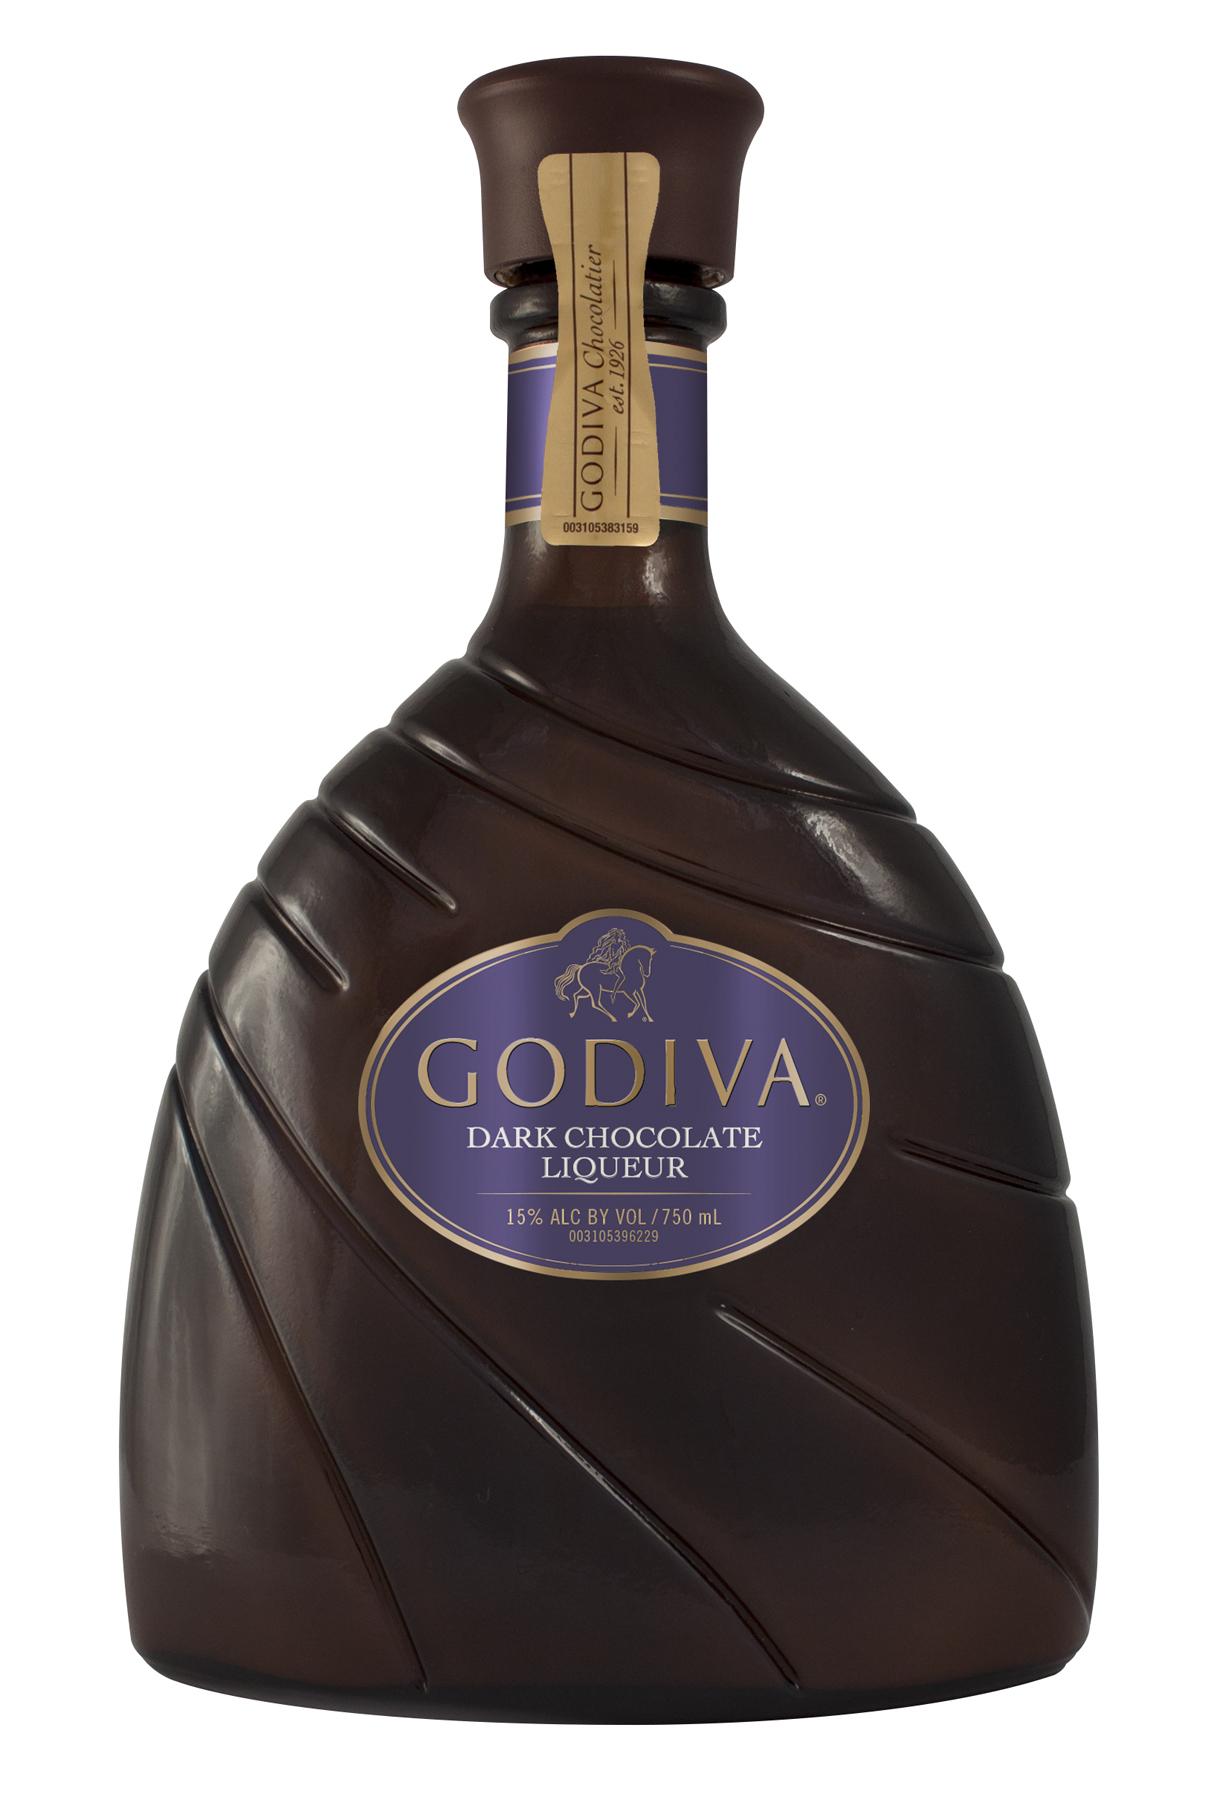 Review: Godiva Dark Chocolate Liqueur – Drinkhacker